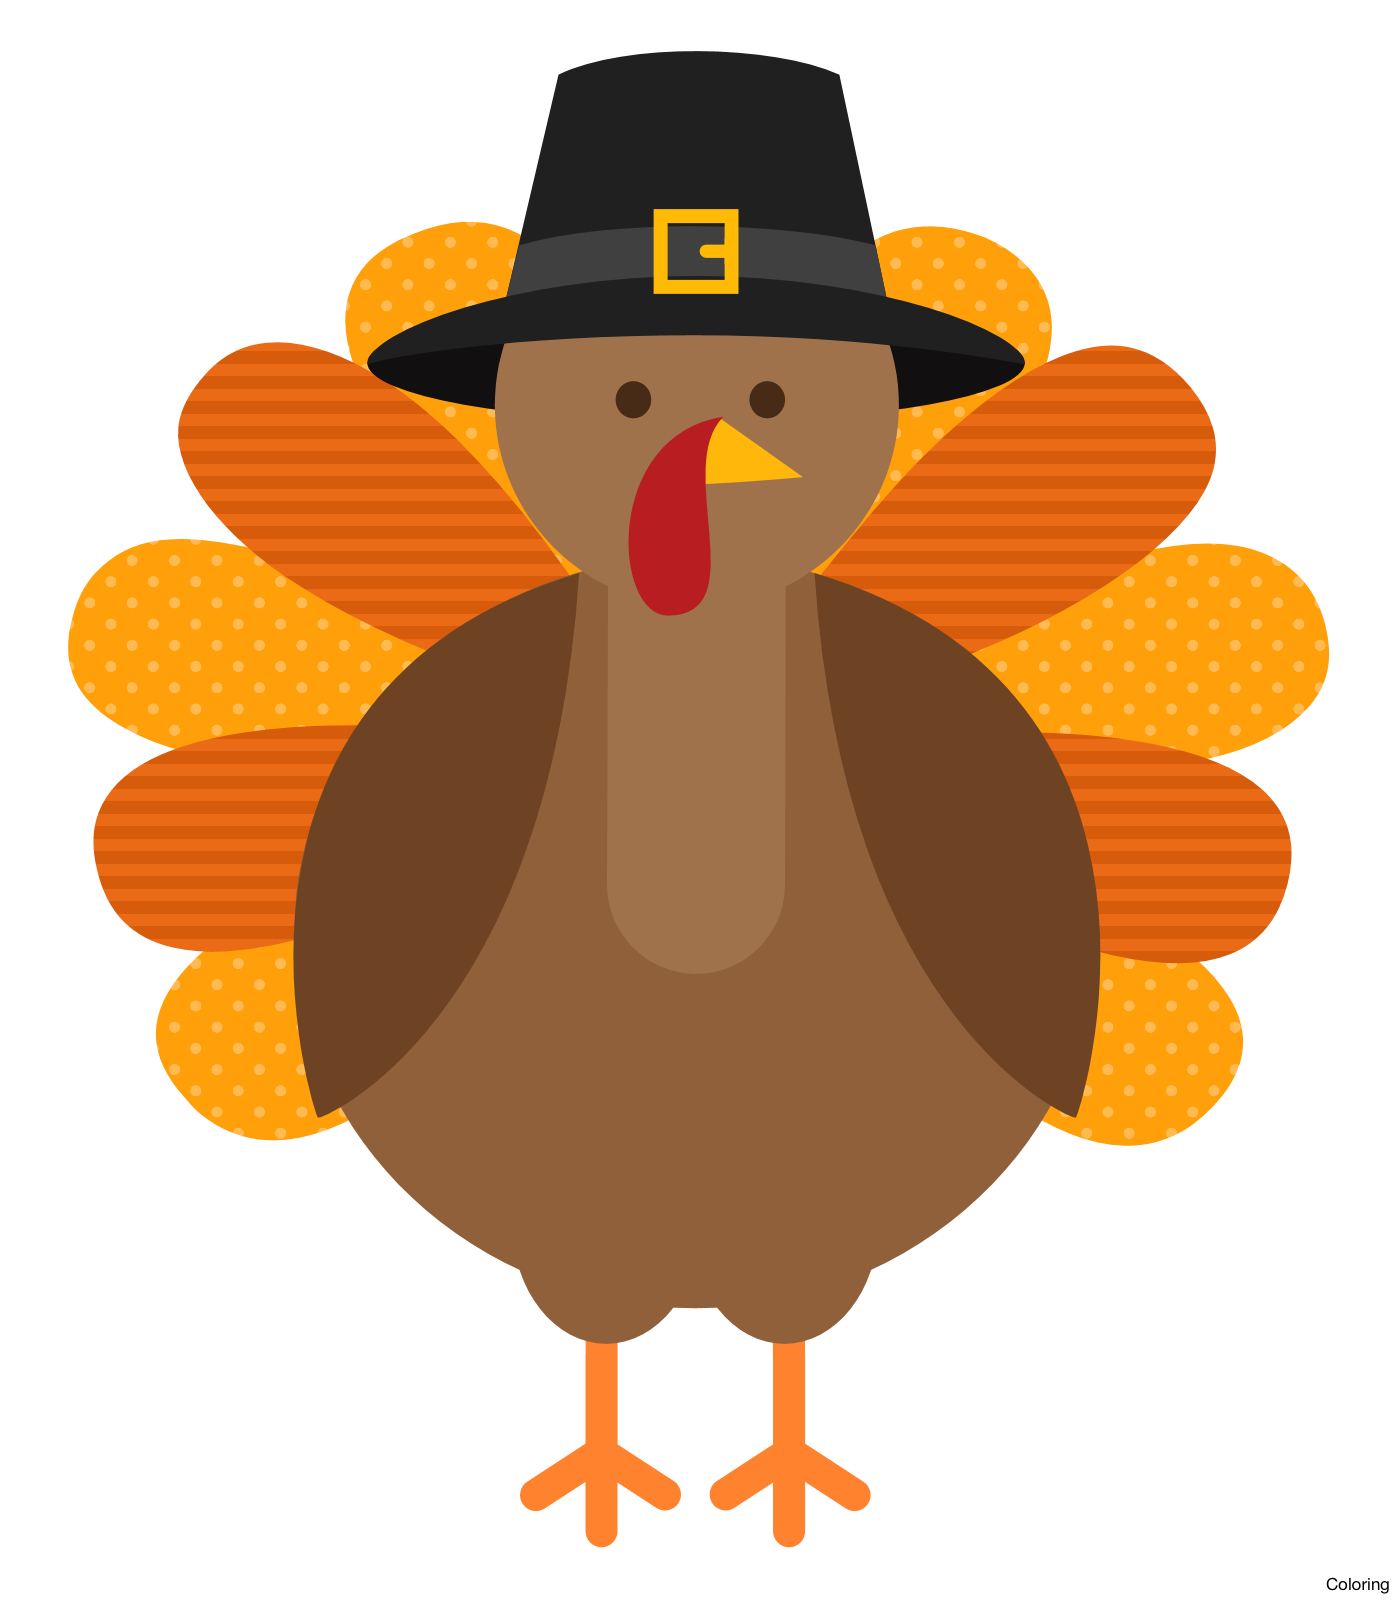 Animated turkey clipart clip black and white stock Animated Turkey Clipart - cilpart clip black and white stock